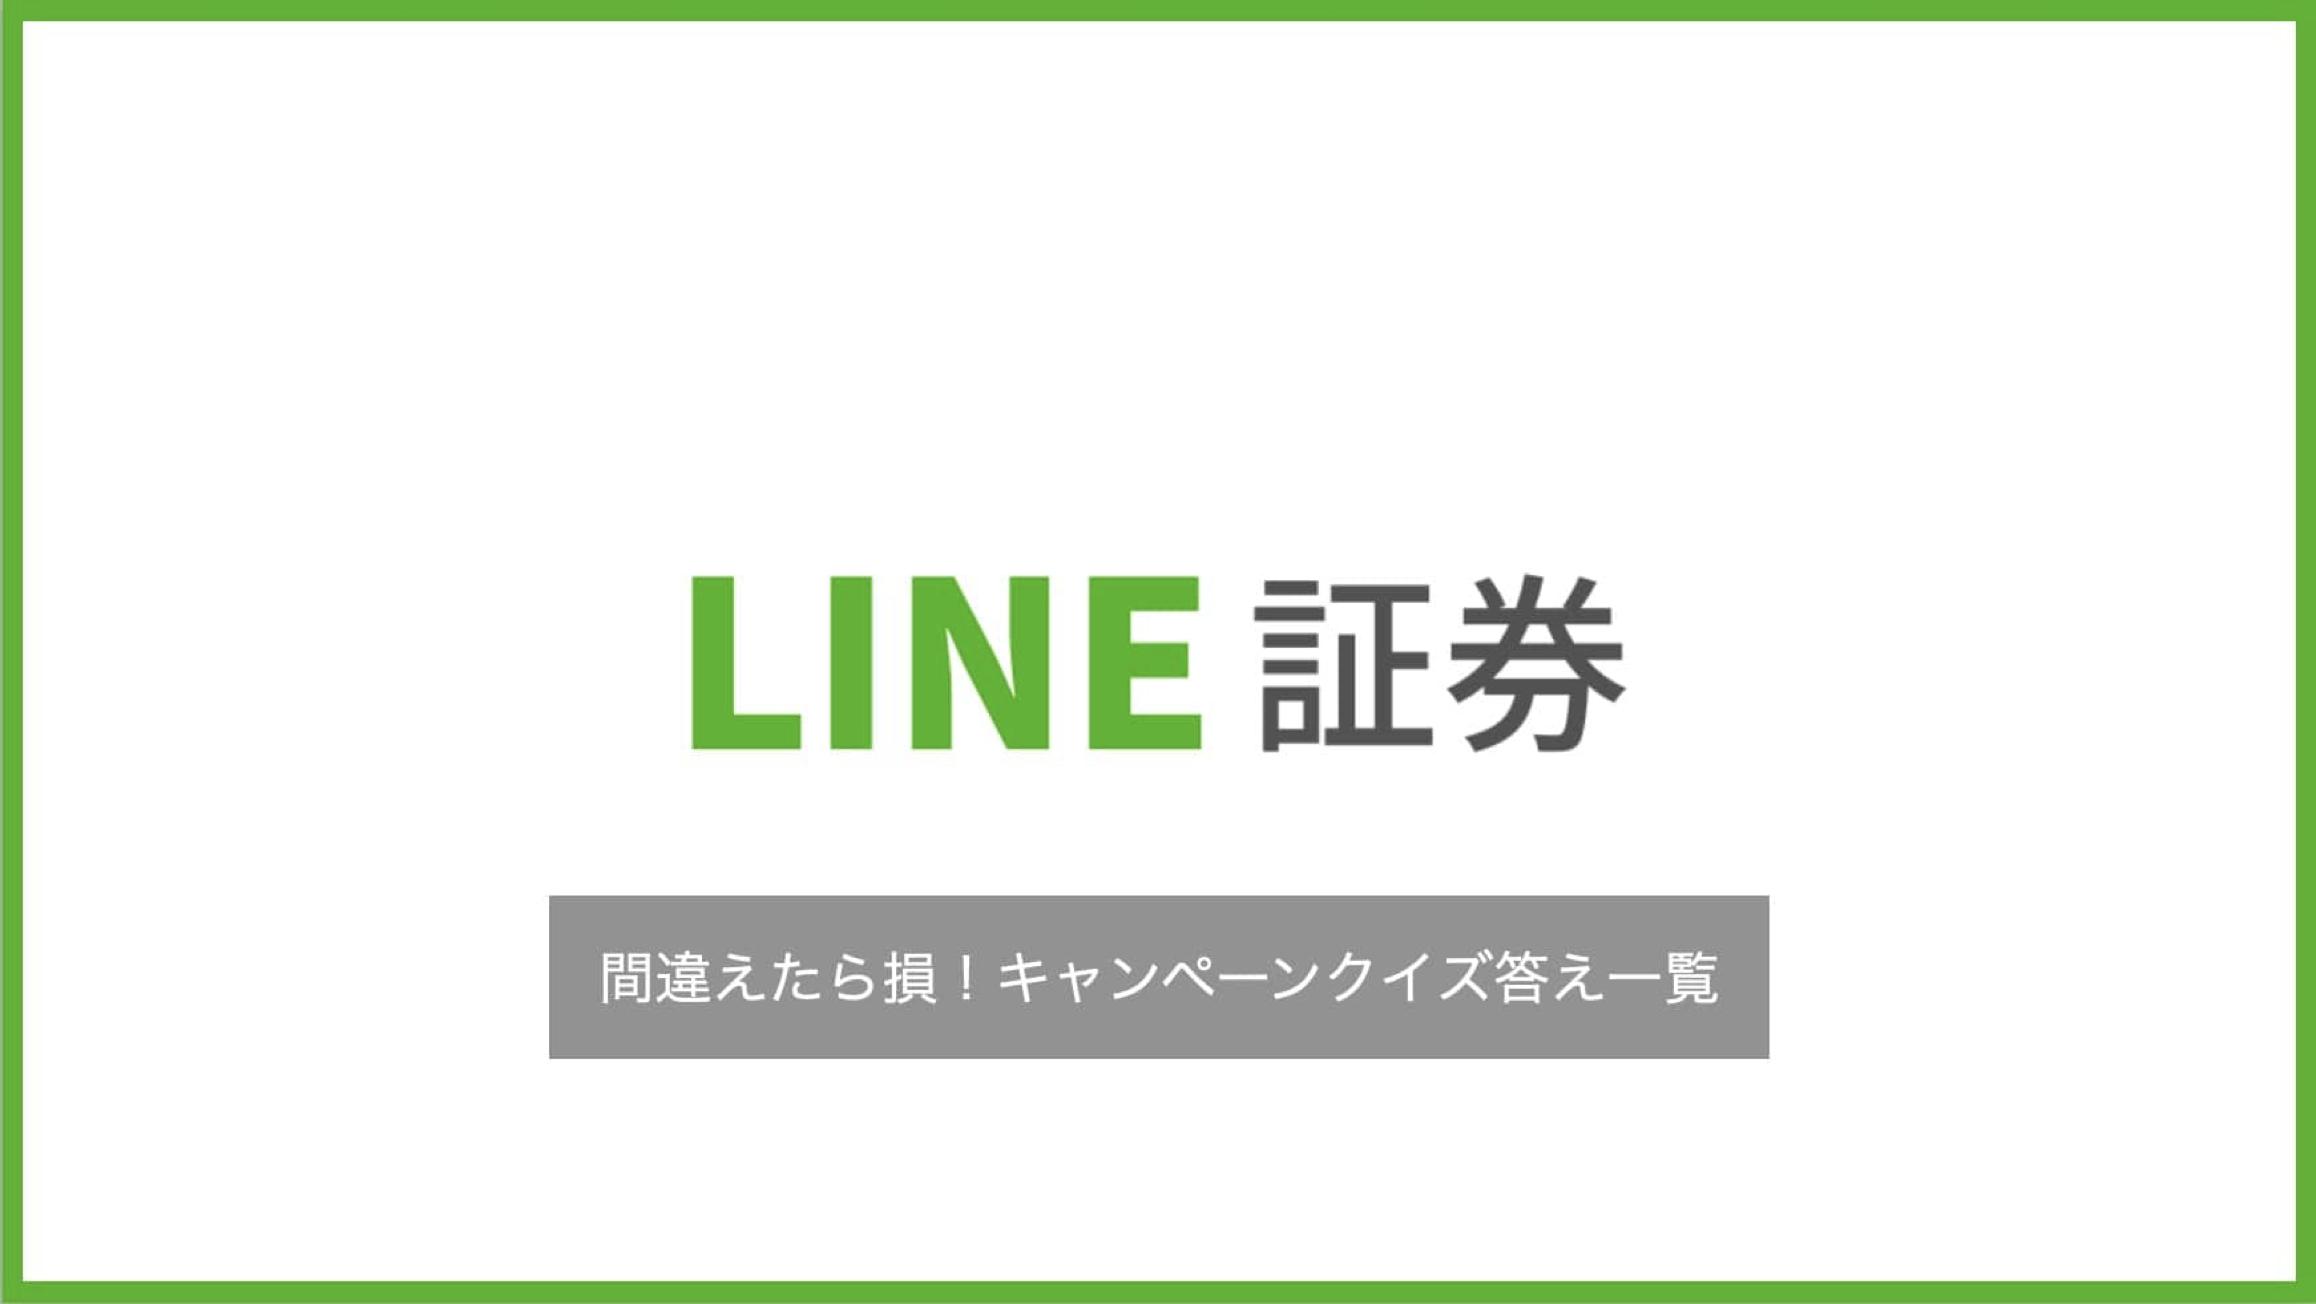 LINE証券 初株キャンペーンクイズの答え一覧